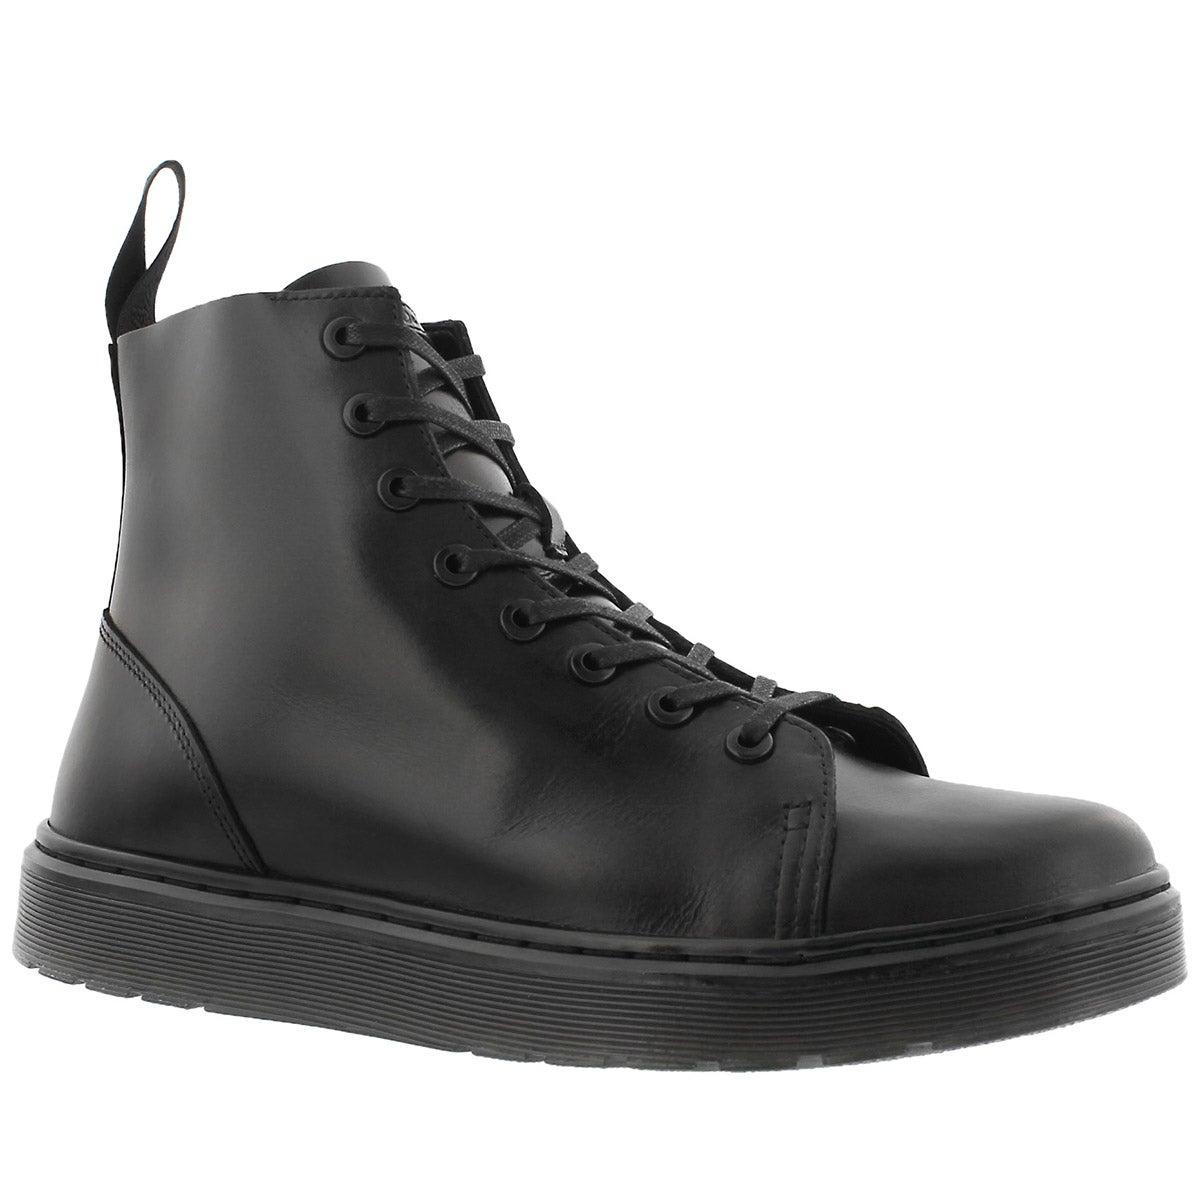 Men's TALIB black 8 eye combat boots